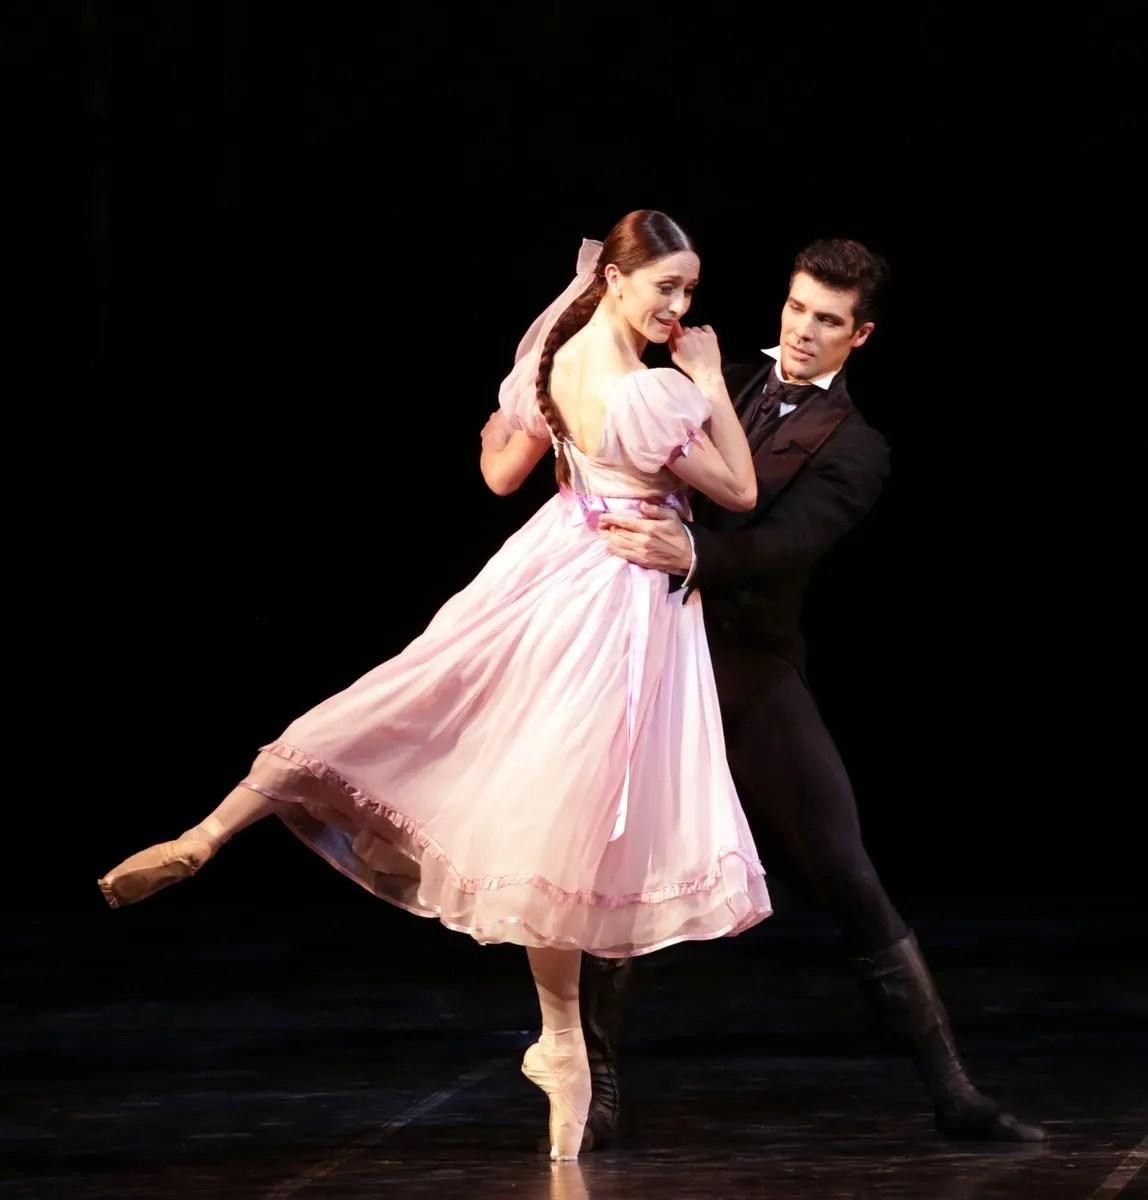 08 Onegin with Roberto Bolle and Marianela Nuñez photo by Brescia and Amisano, Teatro alla Scala 2019